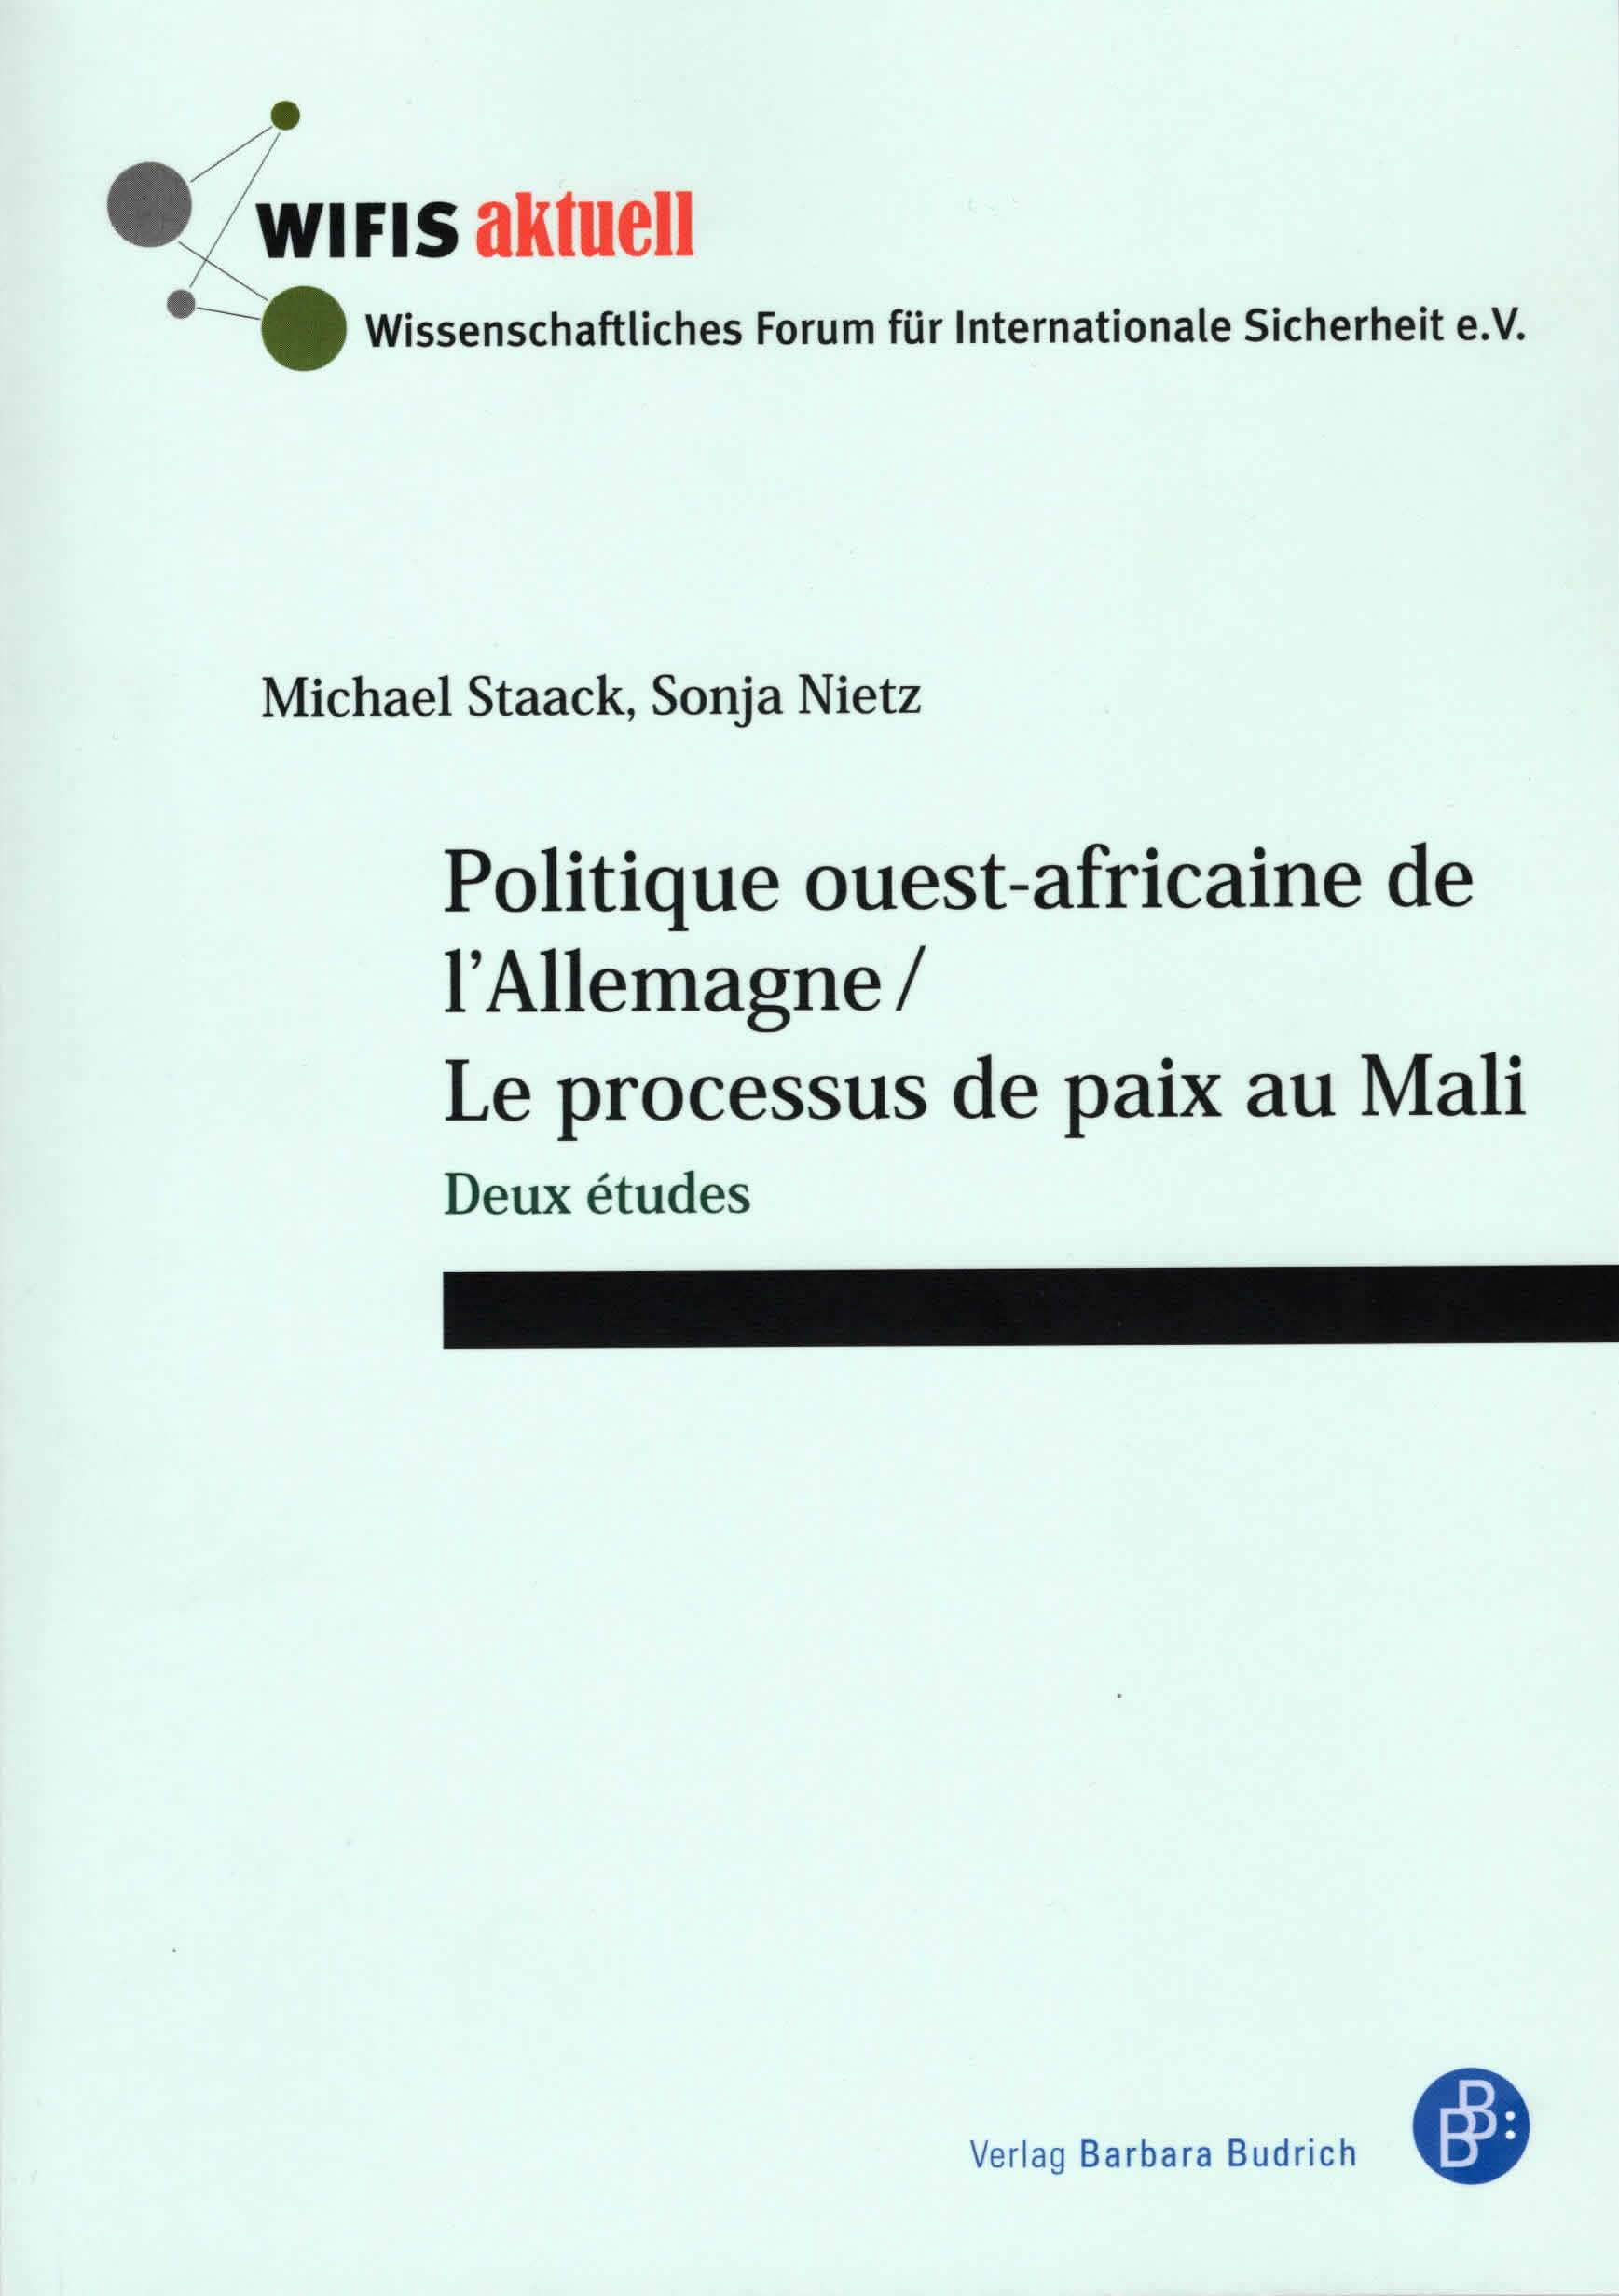 Politique ouest-africaine de l'Allgemagne-Cover